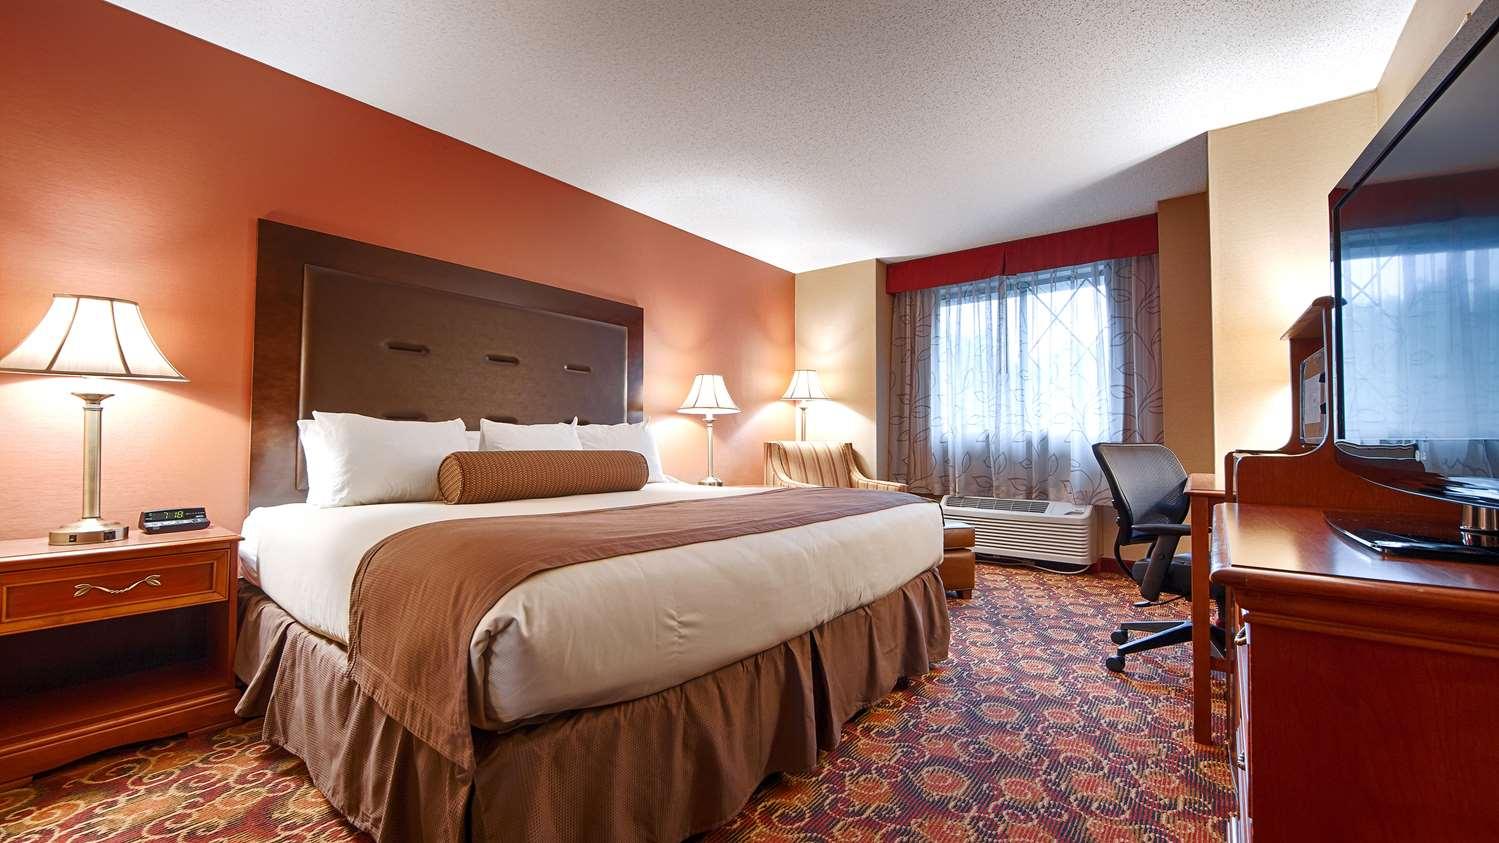 hotels sharon ma best western plus the inn at sharon foxboro